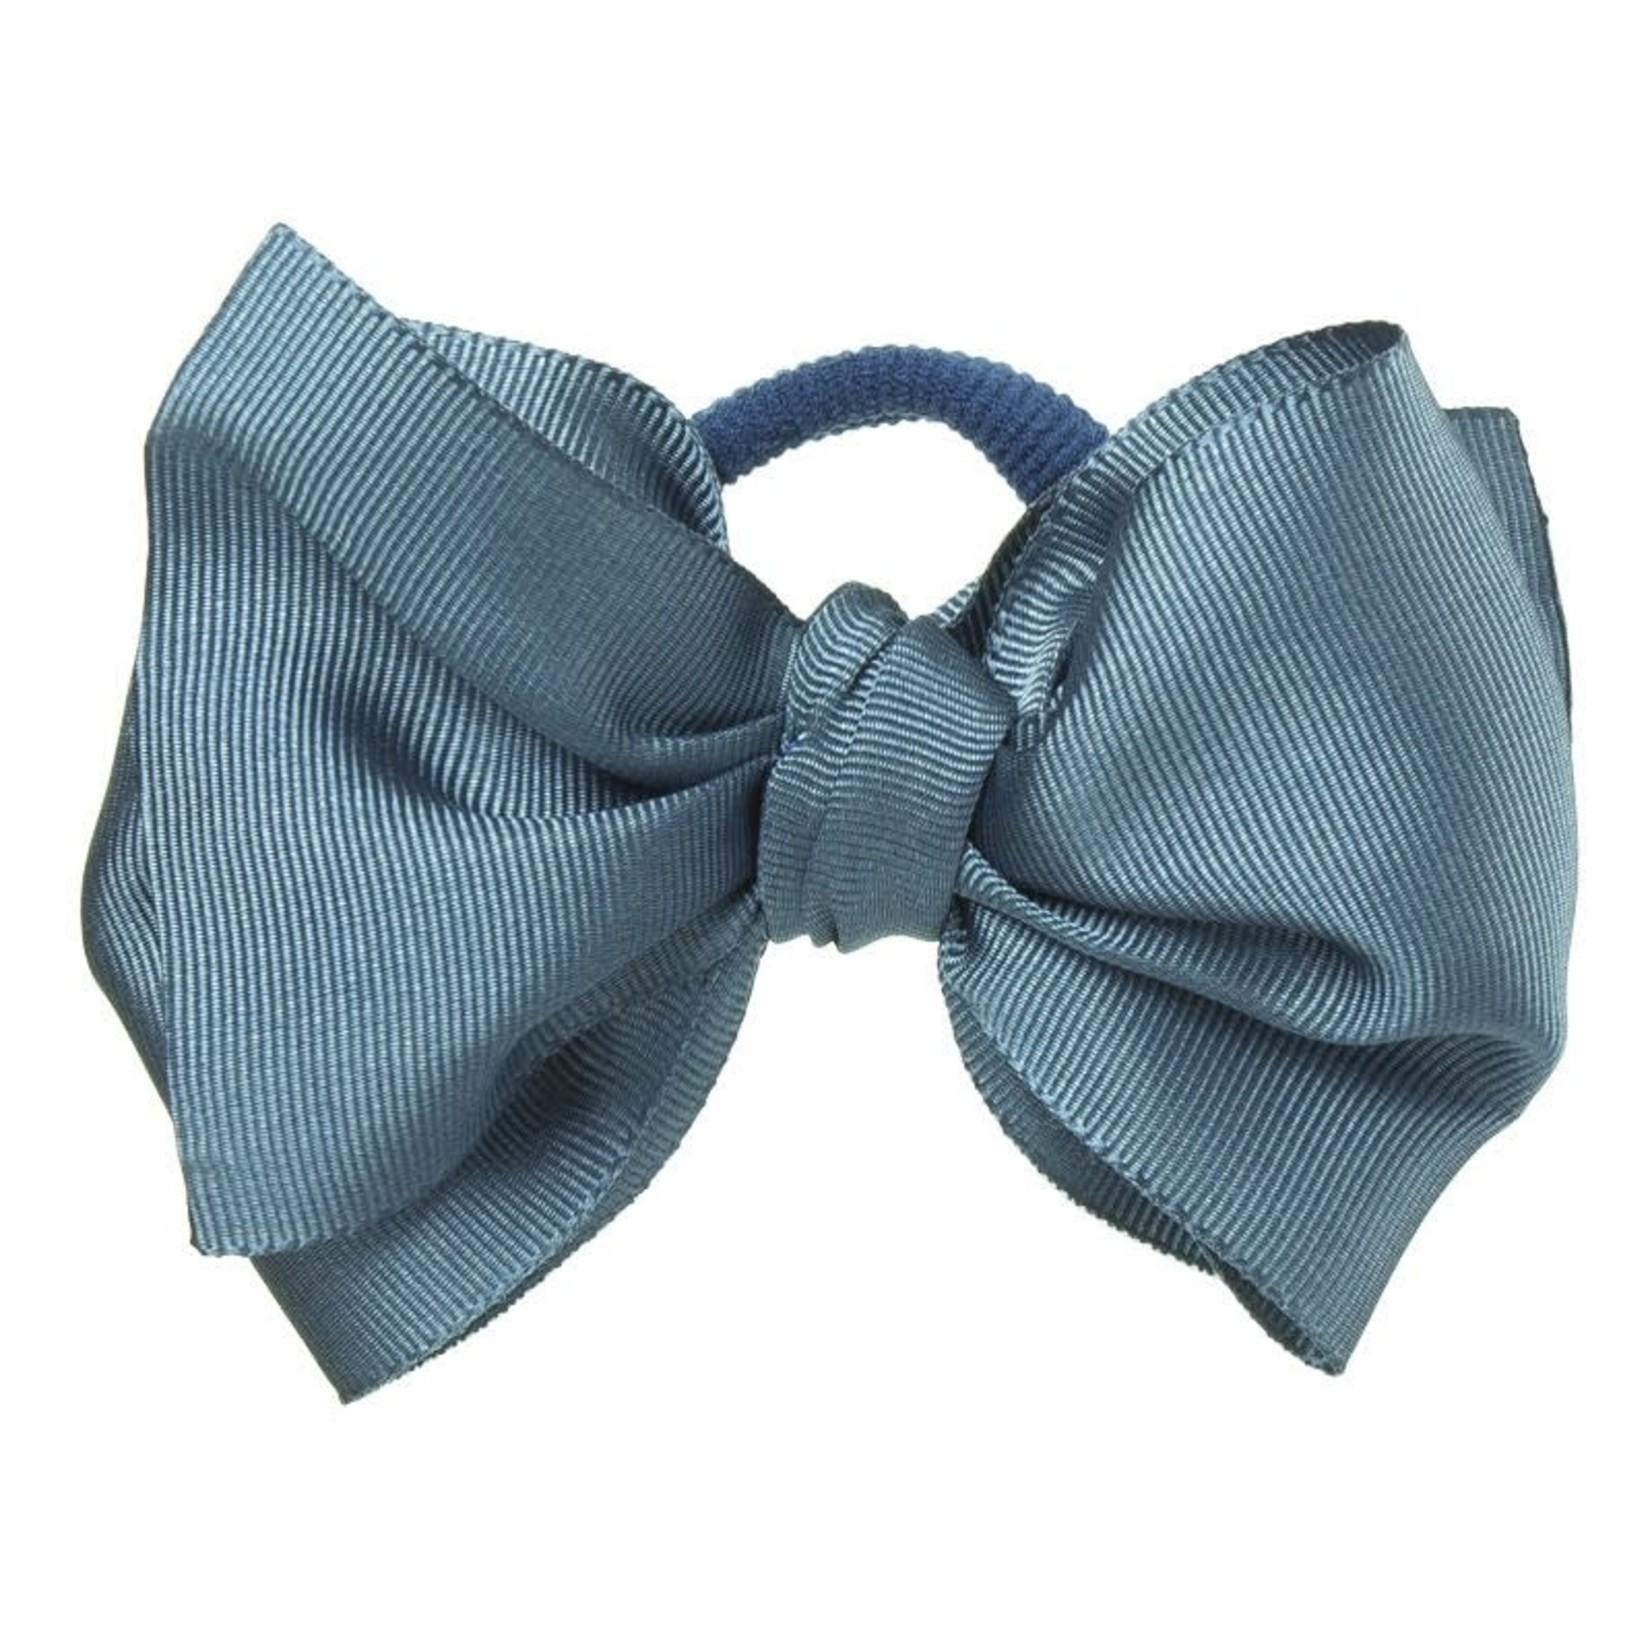 Siena Hair Bow - Blue Gray